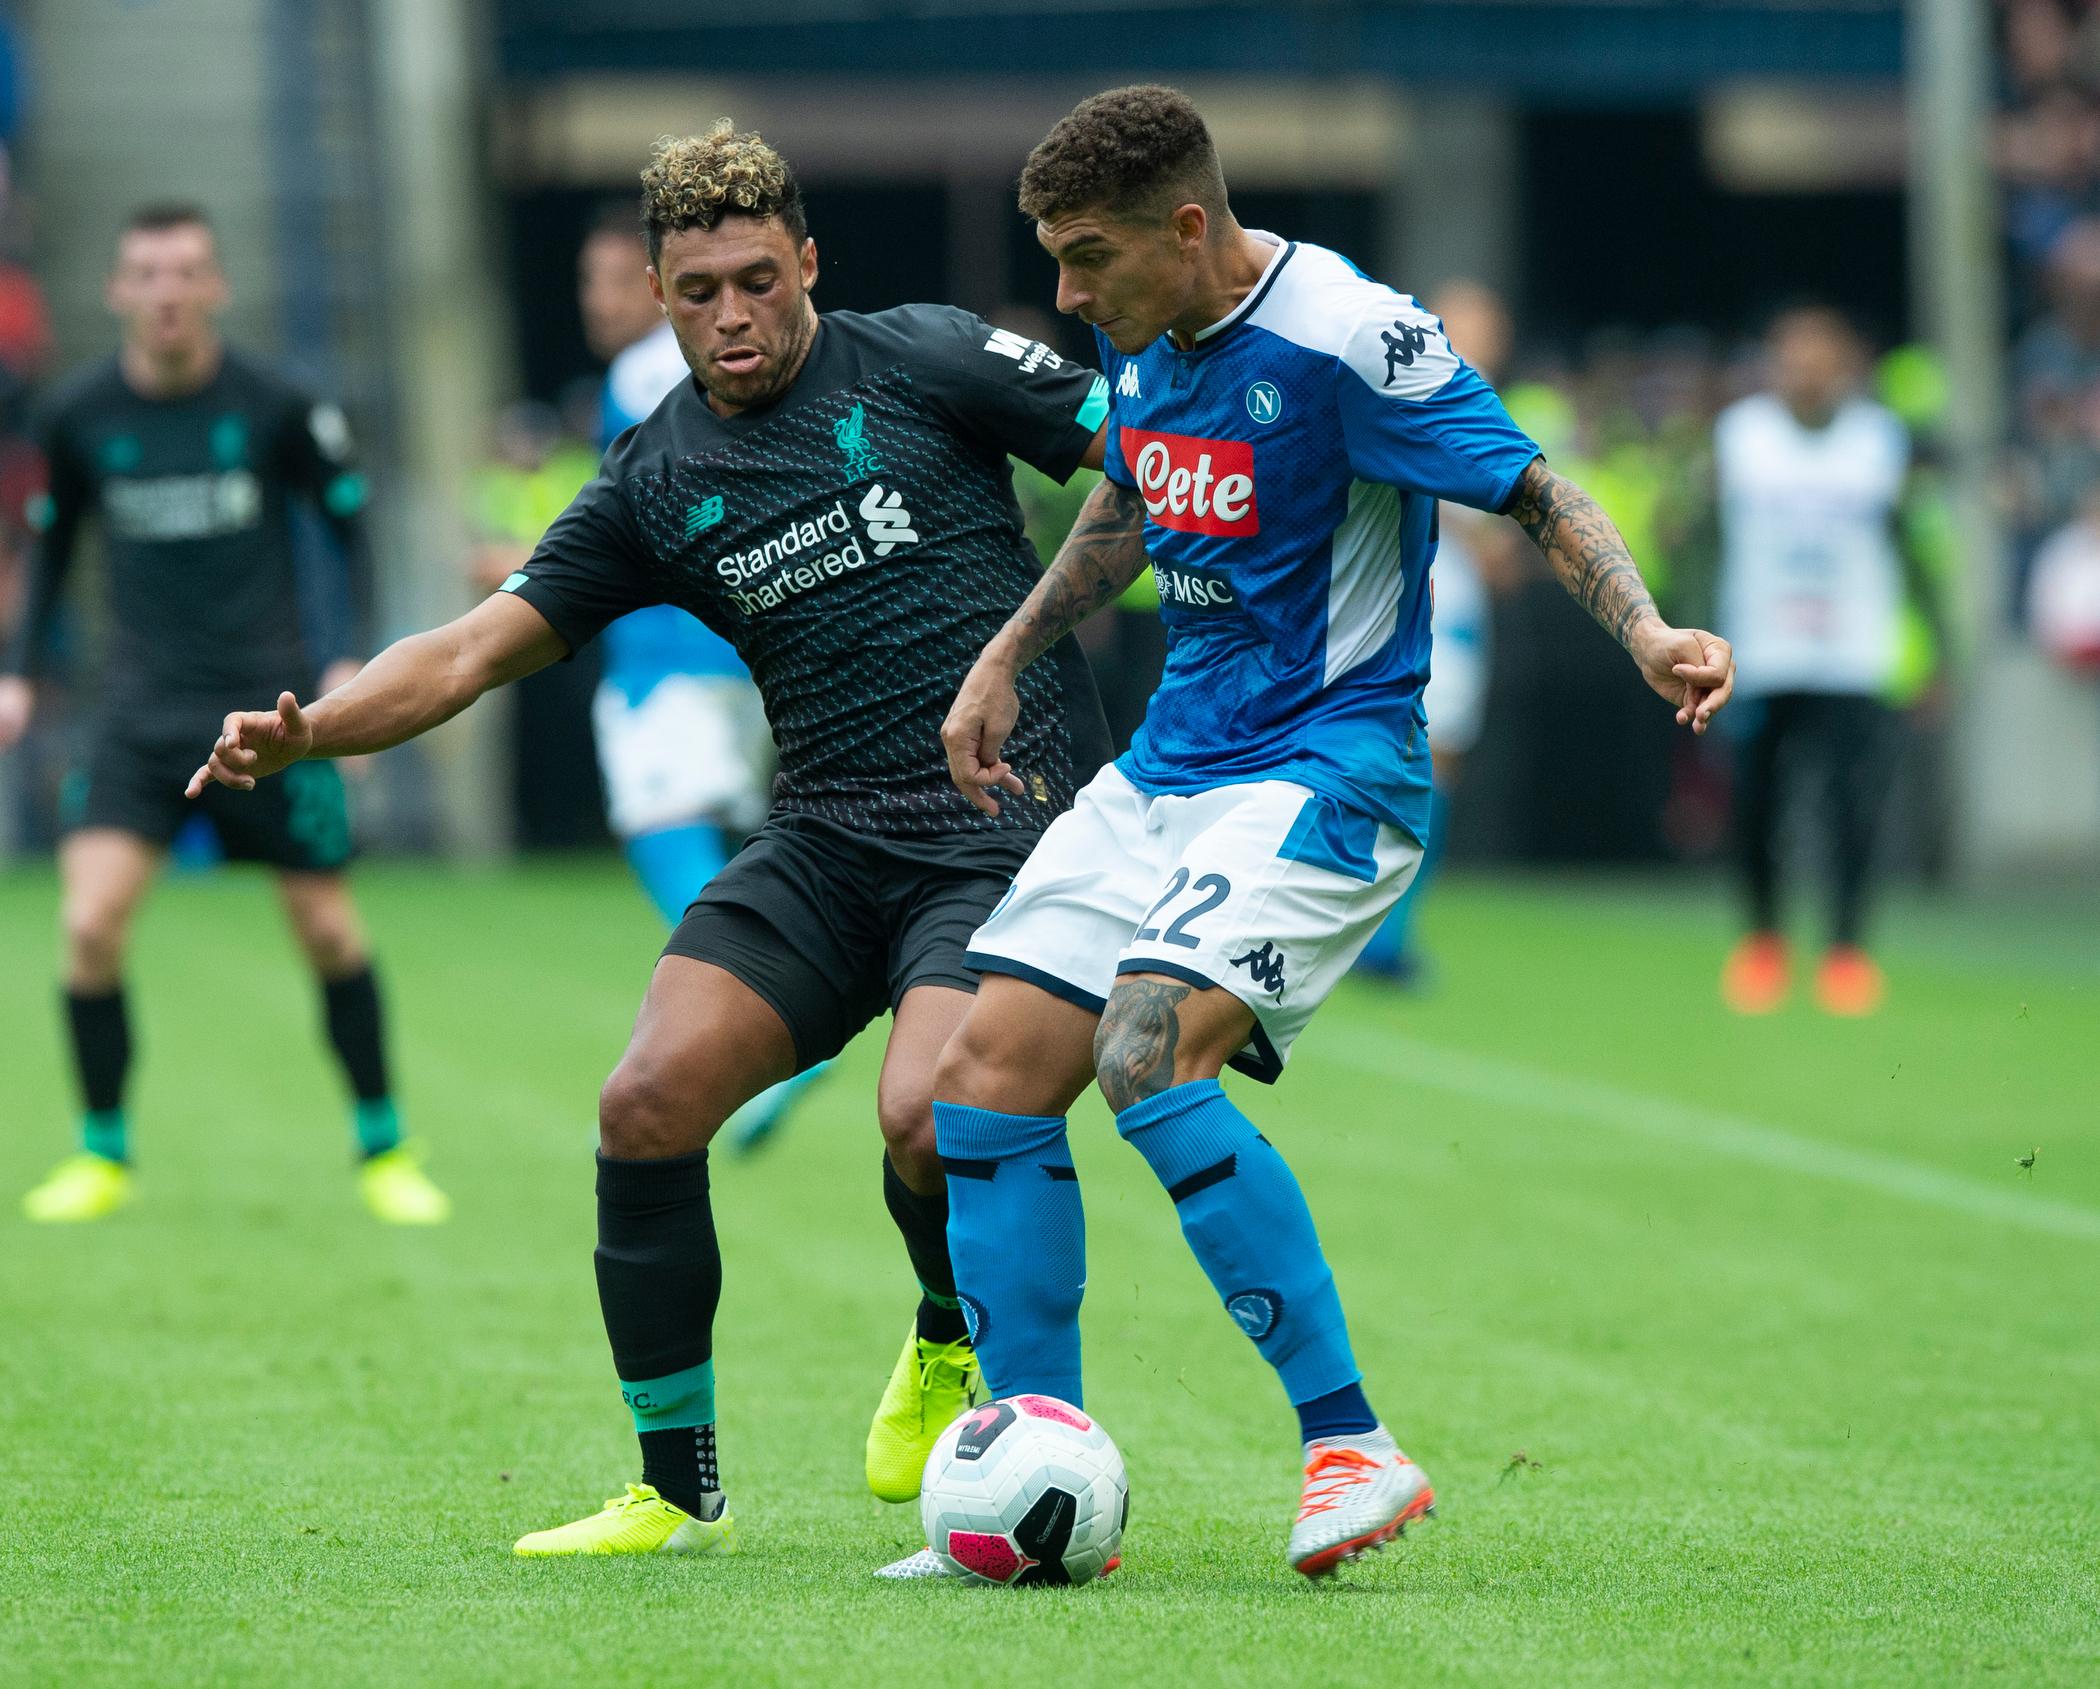 Liverpool v SSC Napoli - Pre-Season Friendly